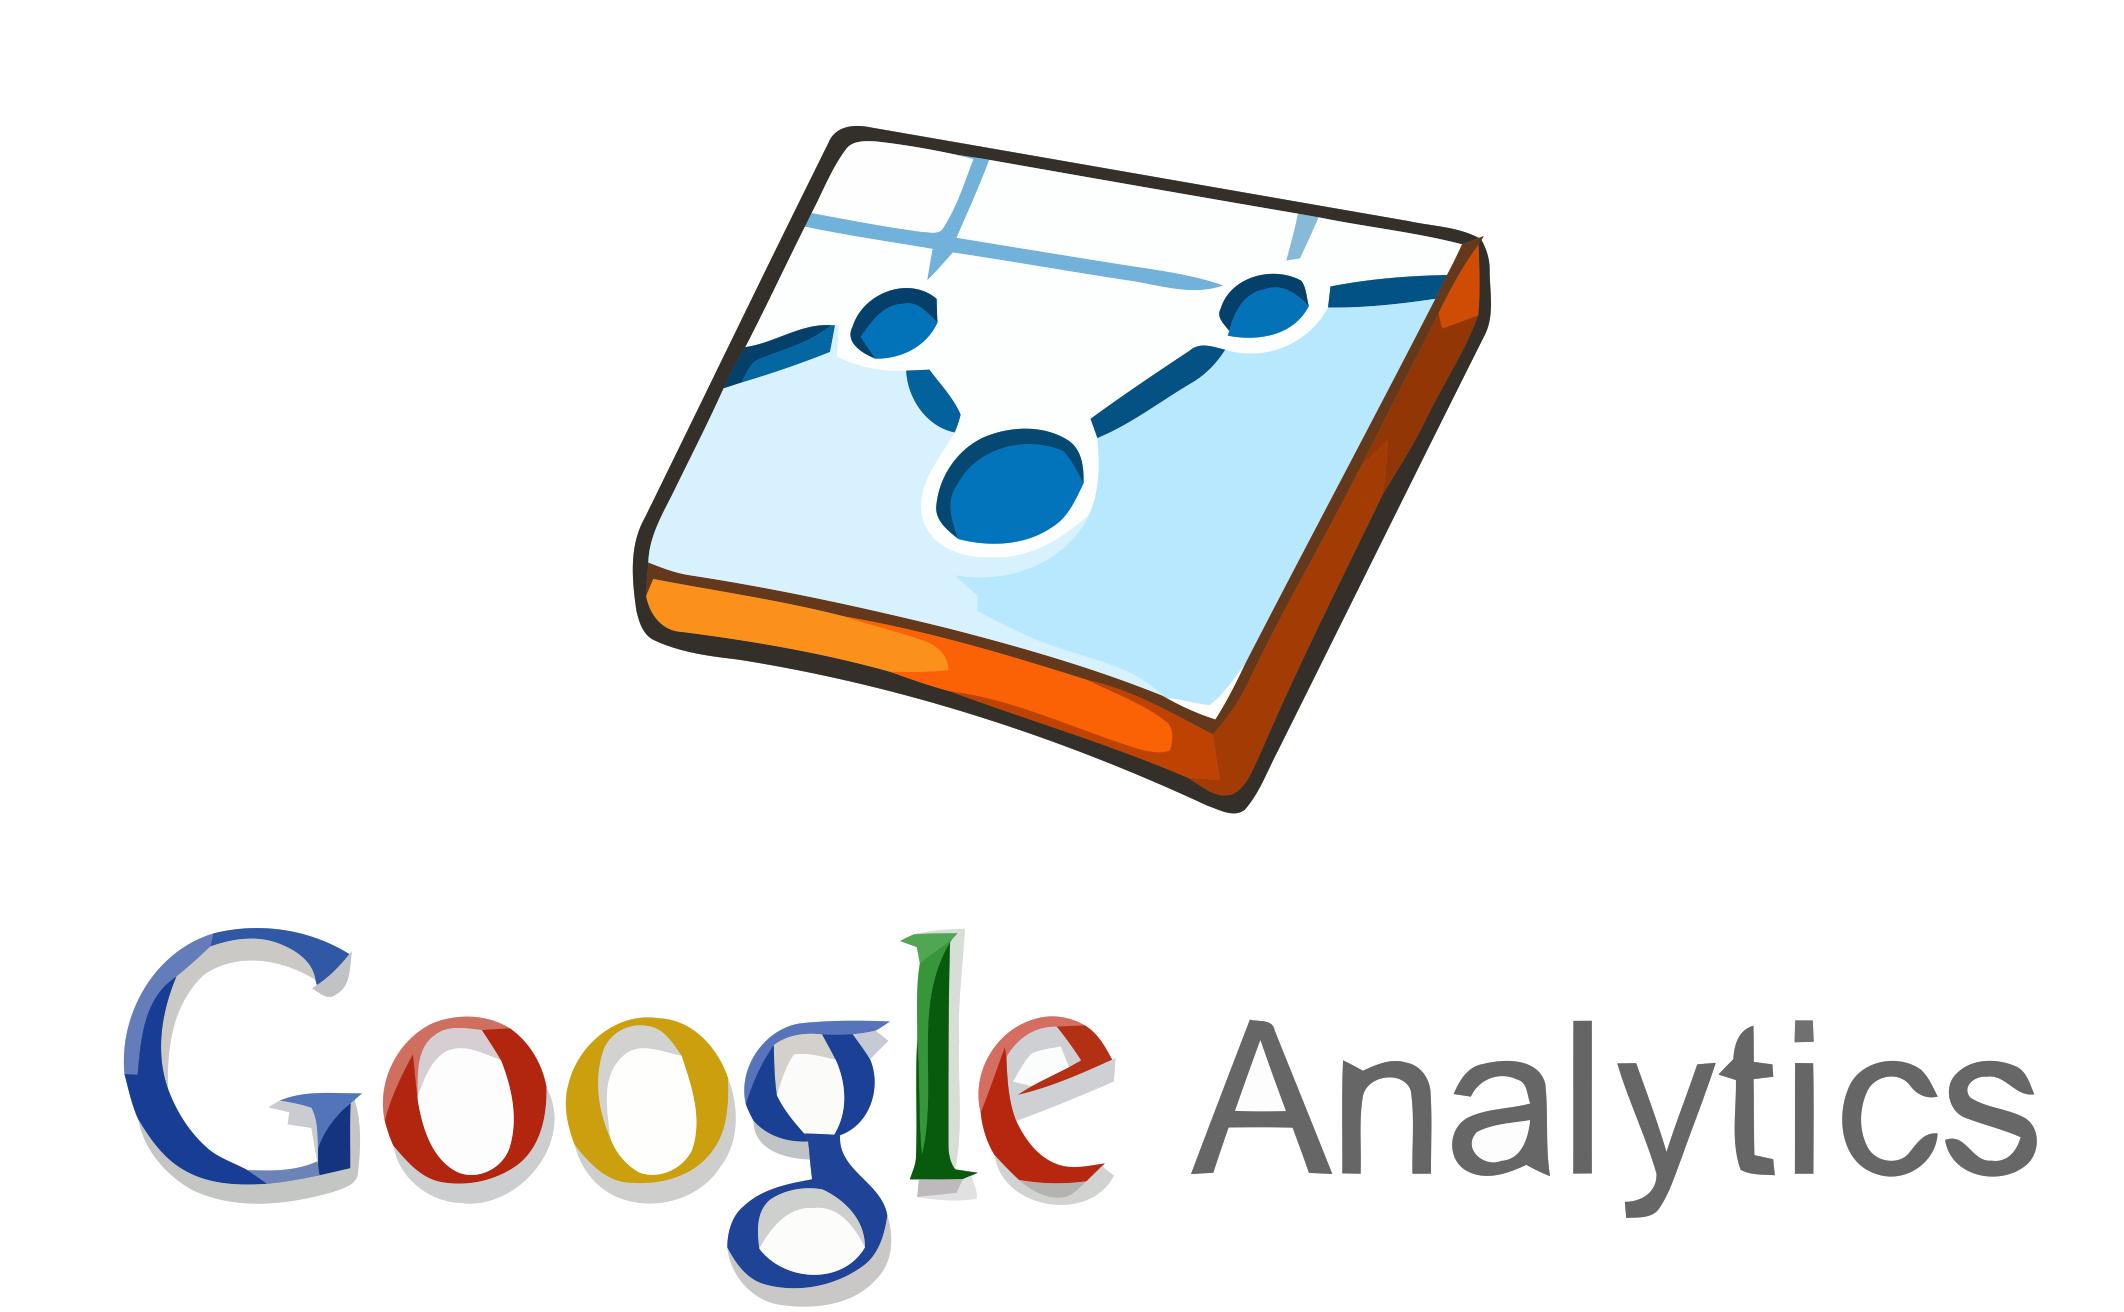 Delete-domain-in-Google-Analytics-howto-remove-analytics-website-Google-Analytics_logo